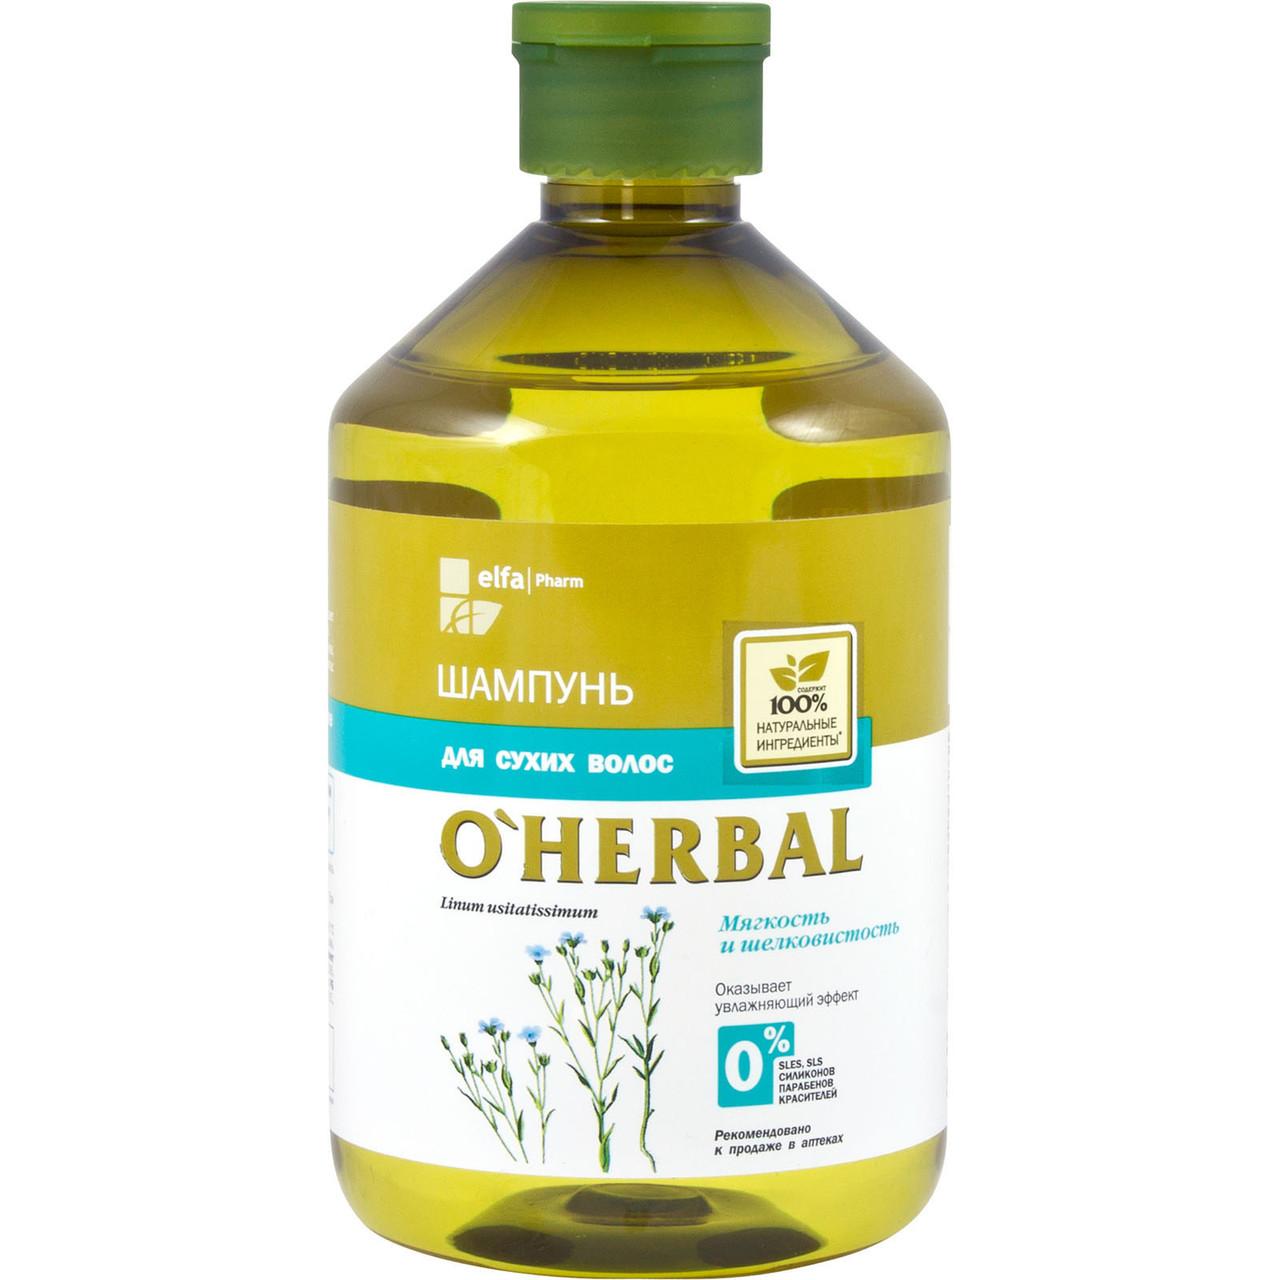 Шампунь для сухих волос 500 мл,O'Herbal.